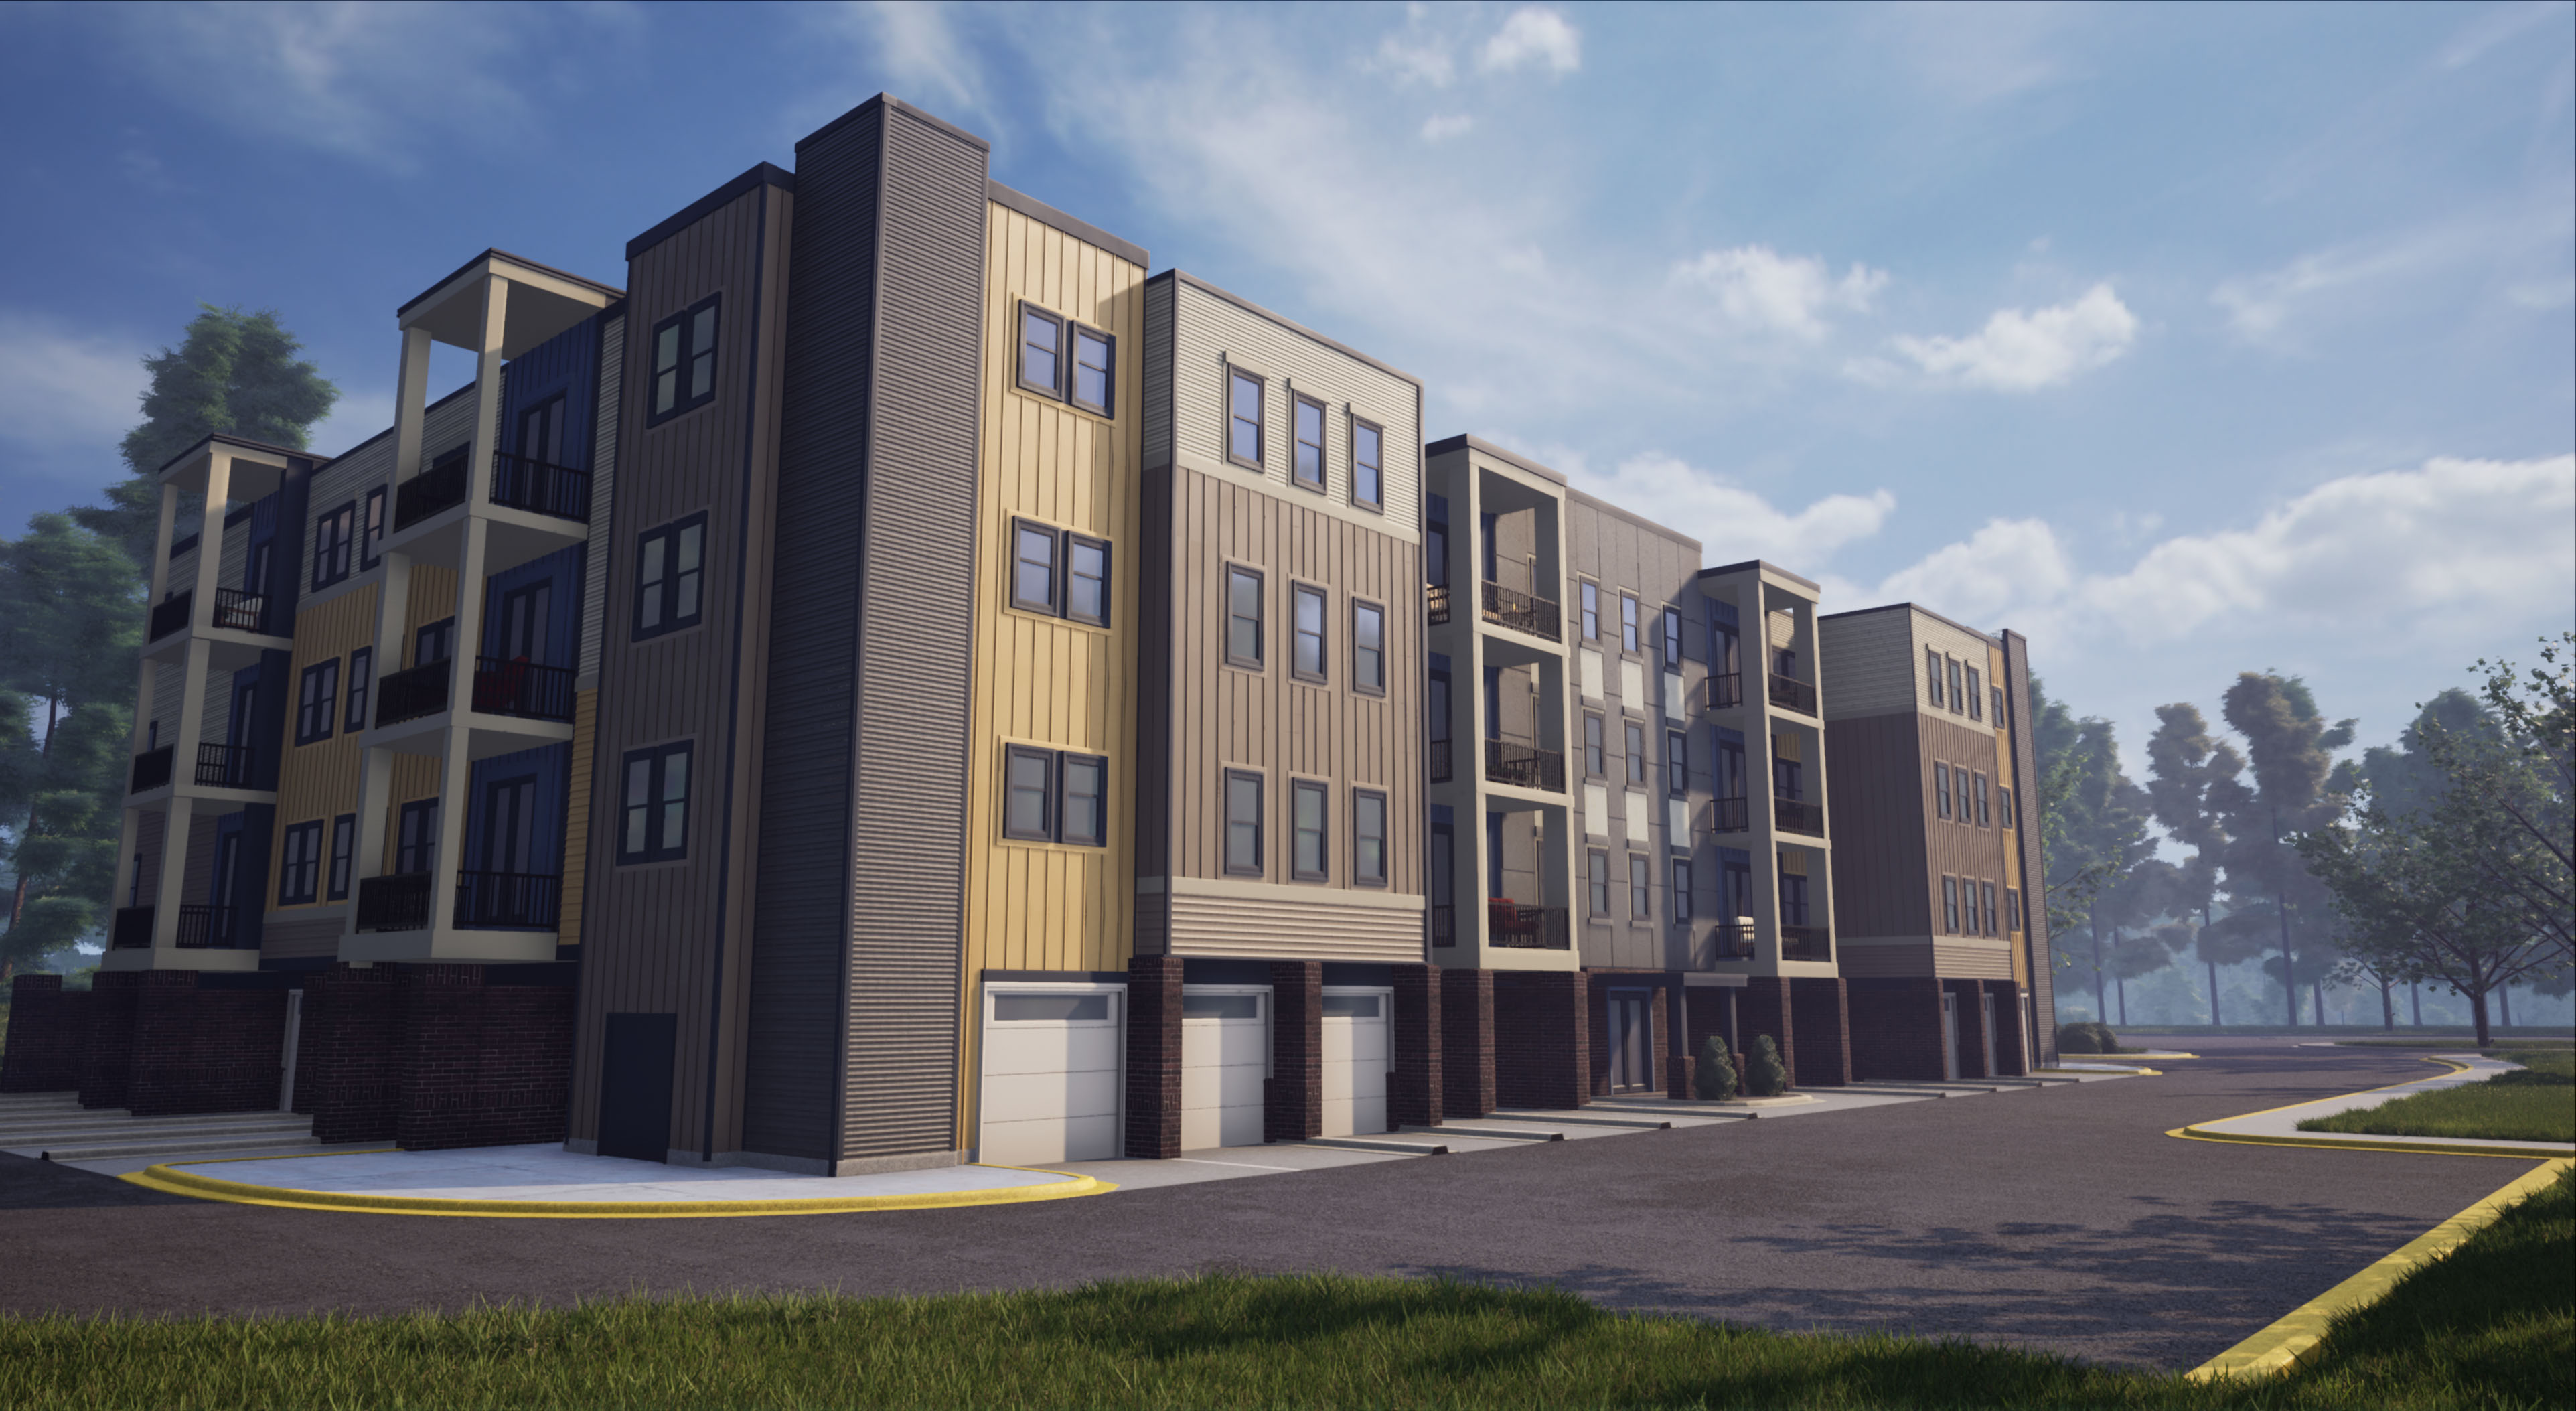 Condominium for Sale at The Signature - Van Metre Homes-Building 1 - The Verdana Ii 43045 Van Metre Drive, Suite 175 Ashburn, Virginia 20148 United States